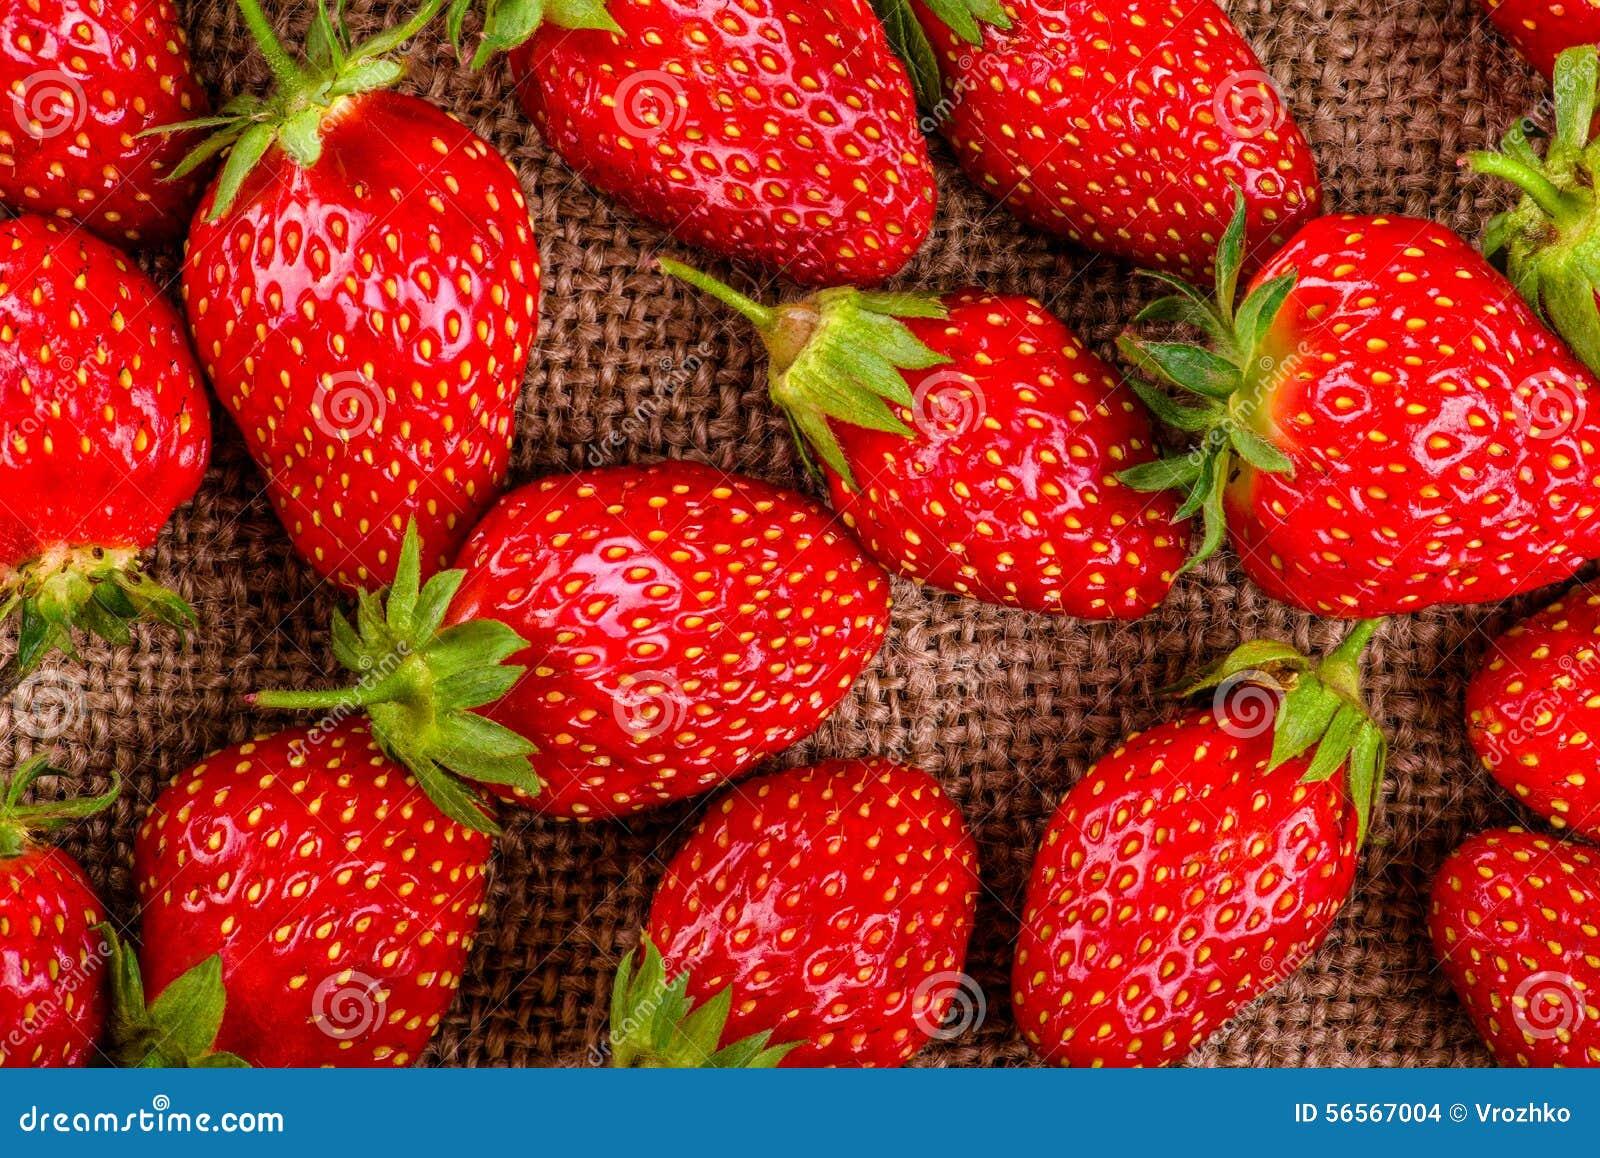 Download Κινηματογράφηση σε πρώτο πλάνο φραουλών σε μια πετσέτα λινού, τοπ άποψη Στοκ Εικόνες - εικόνα από μακροεντολή, ομάδα: 56567004